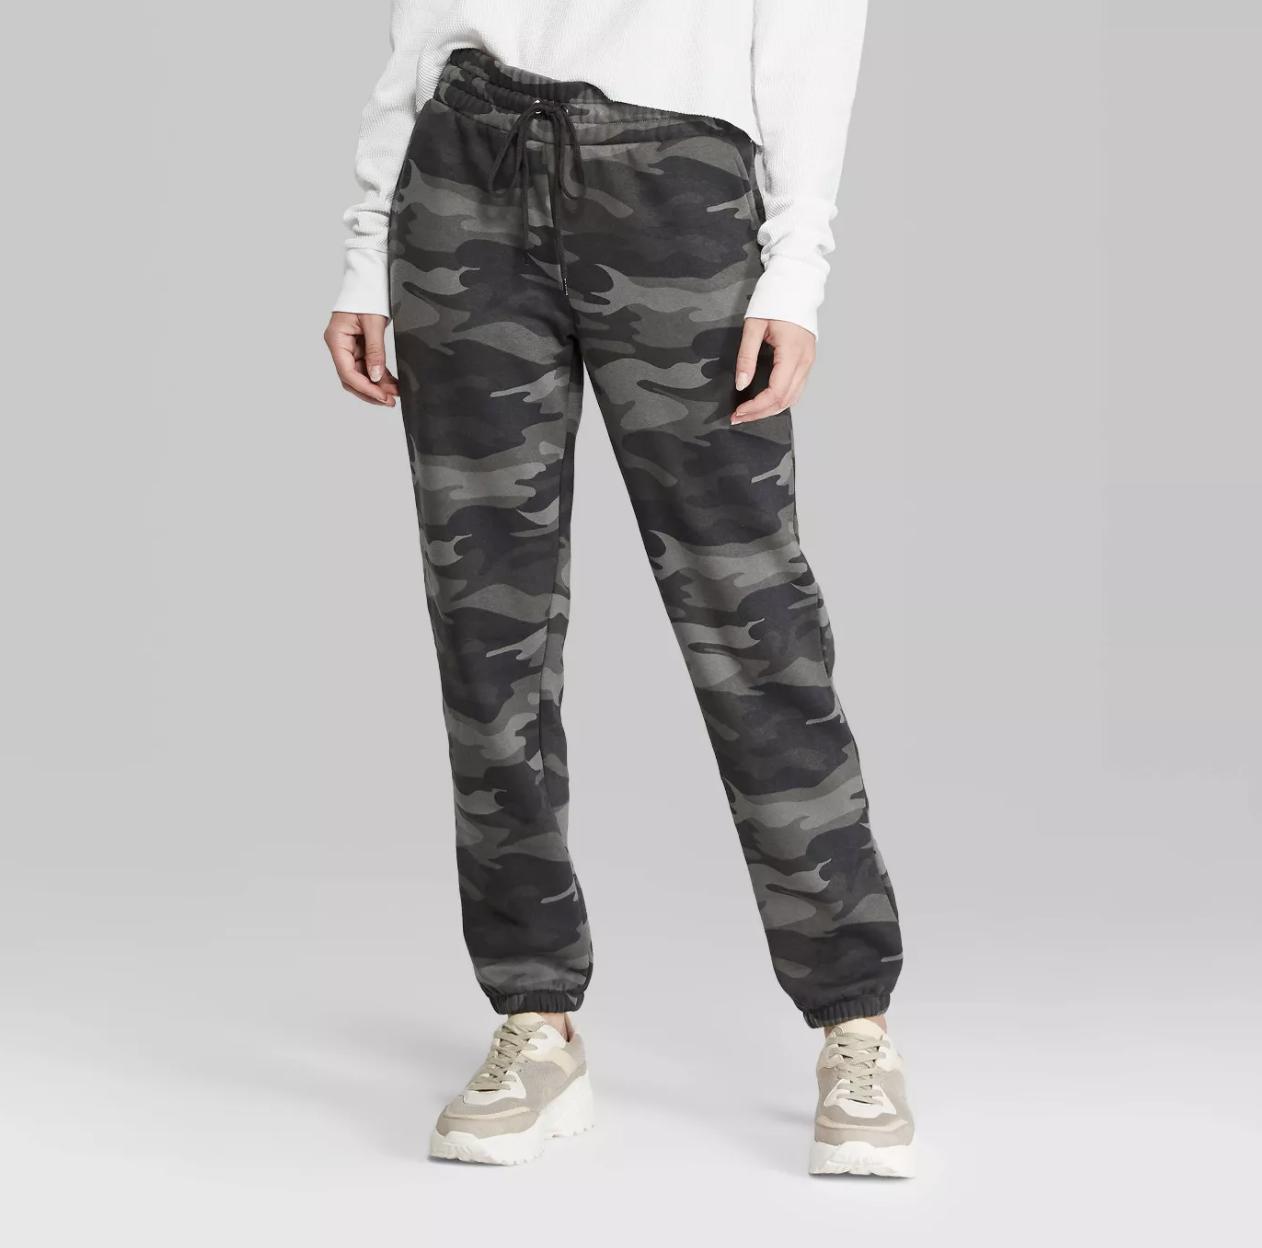 a model wearing grey camo sweatpants